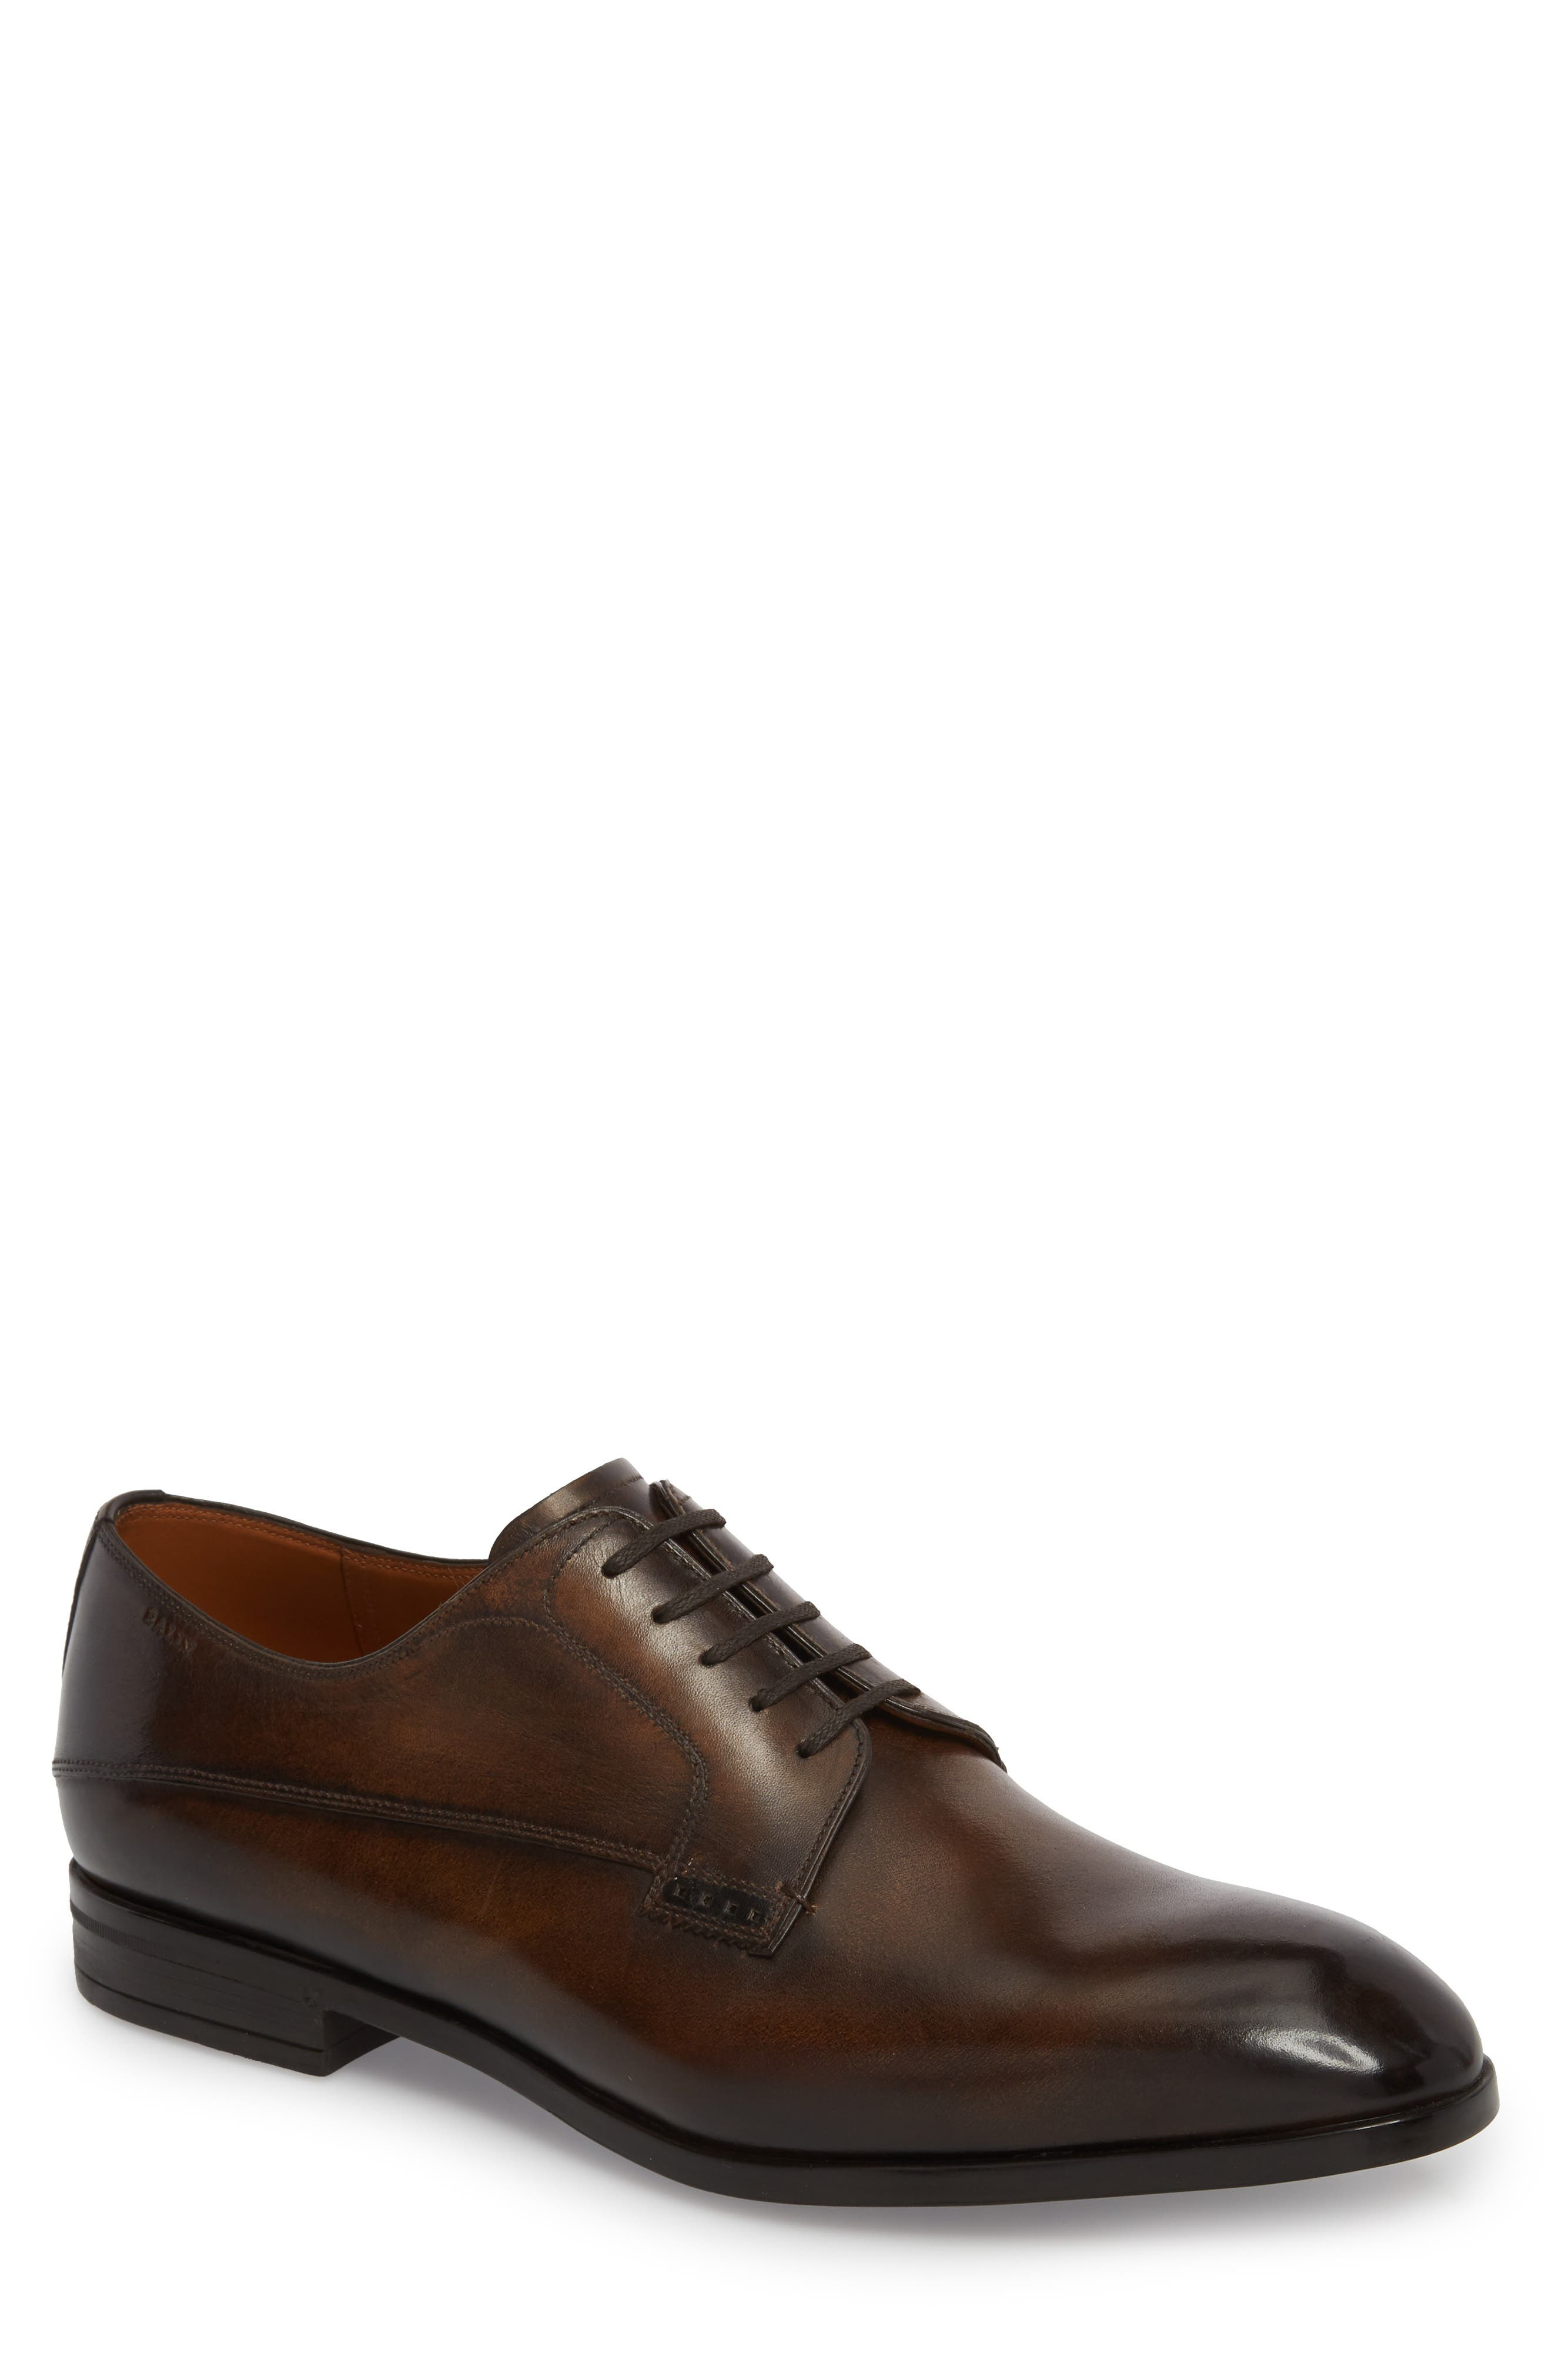 Main Image - Bally Lantel Plain Toe Derby (Men)